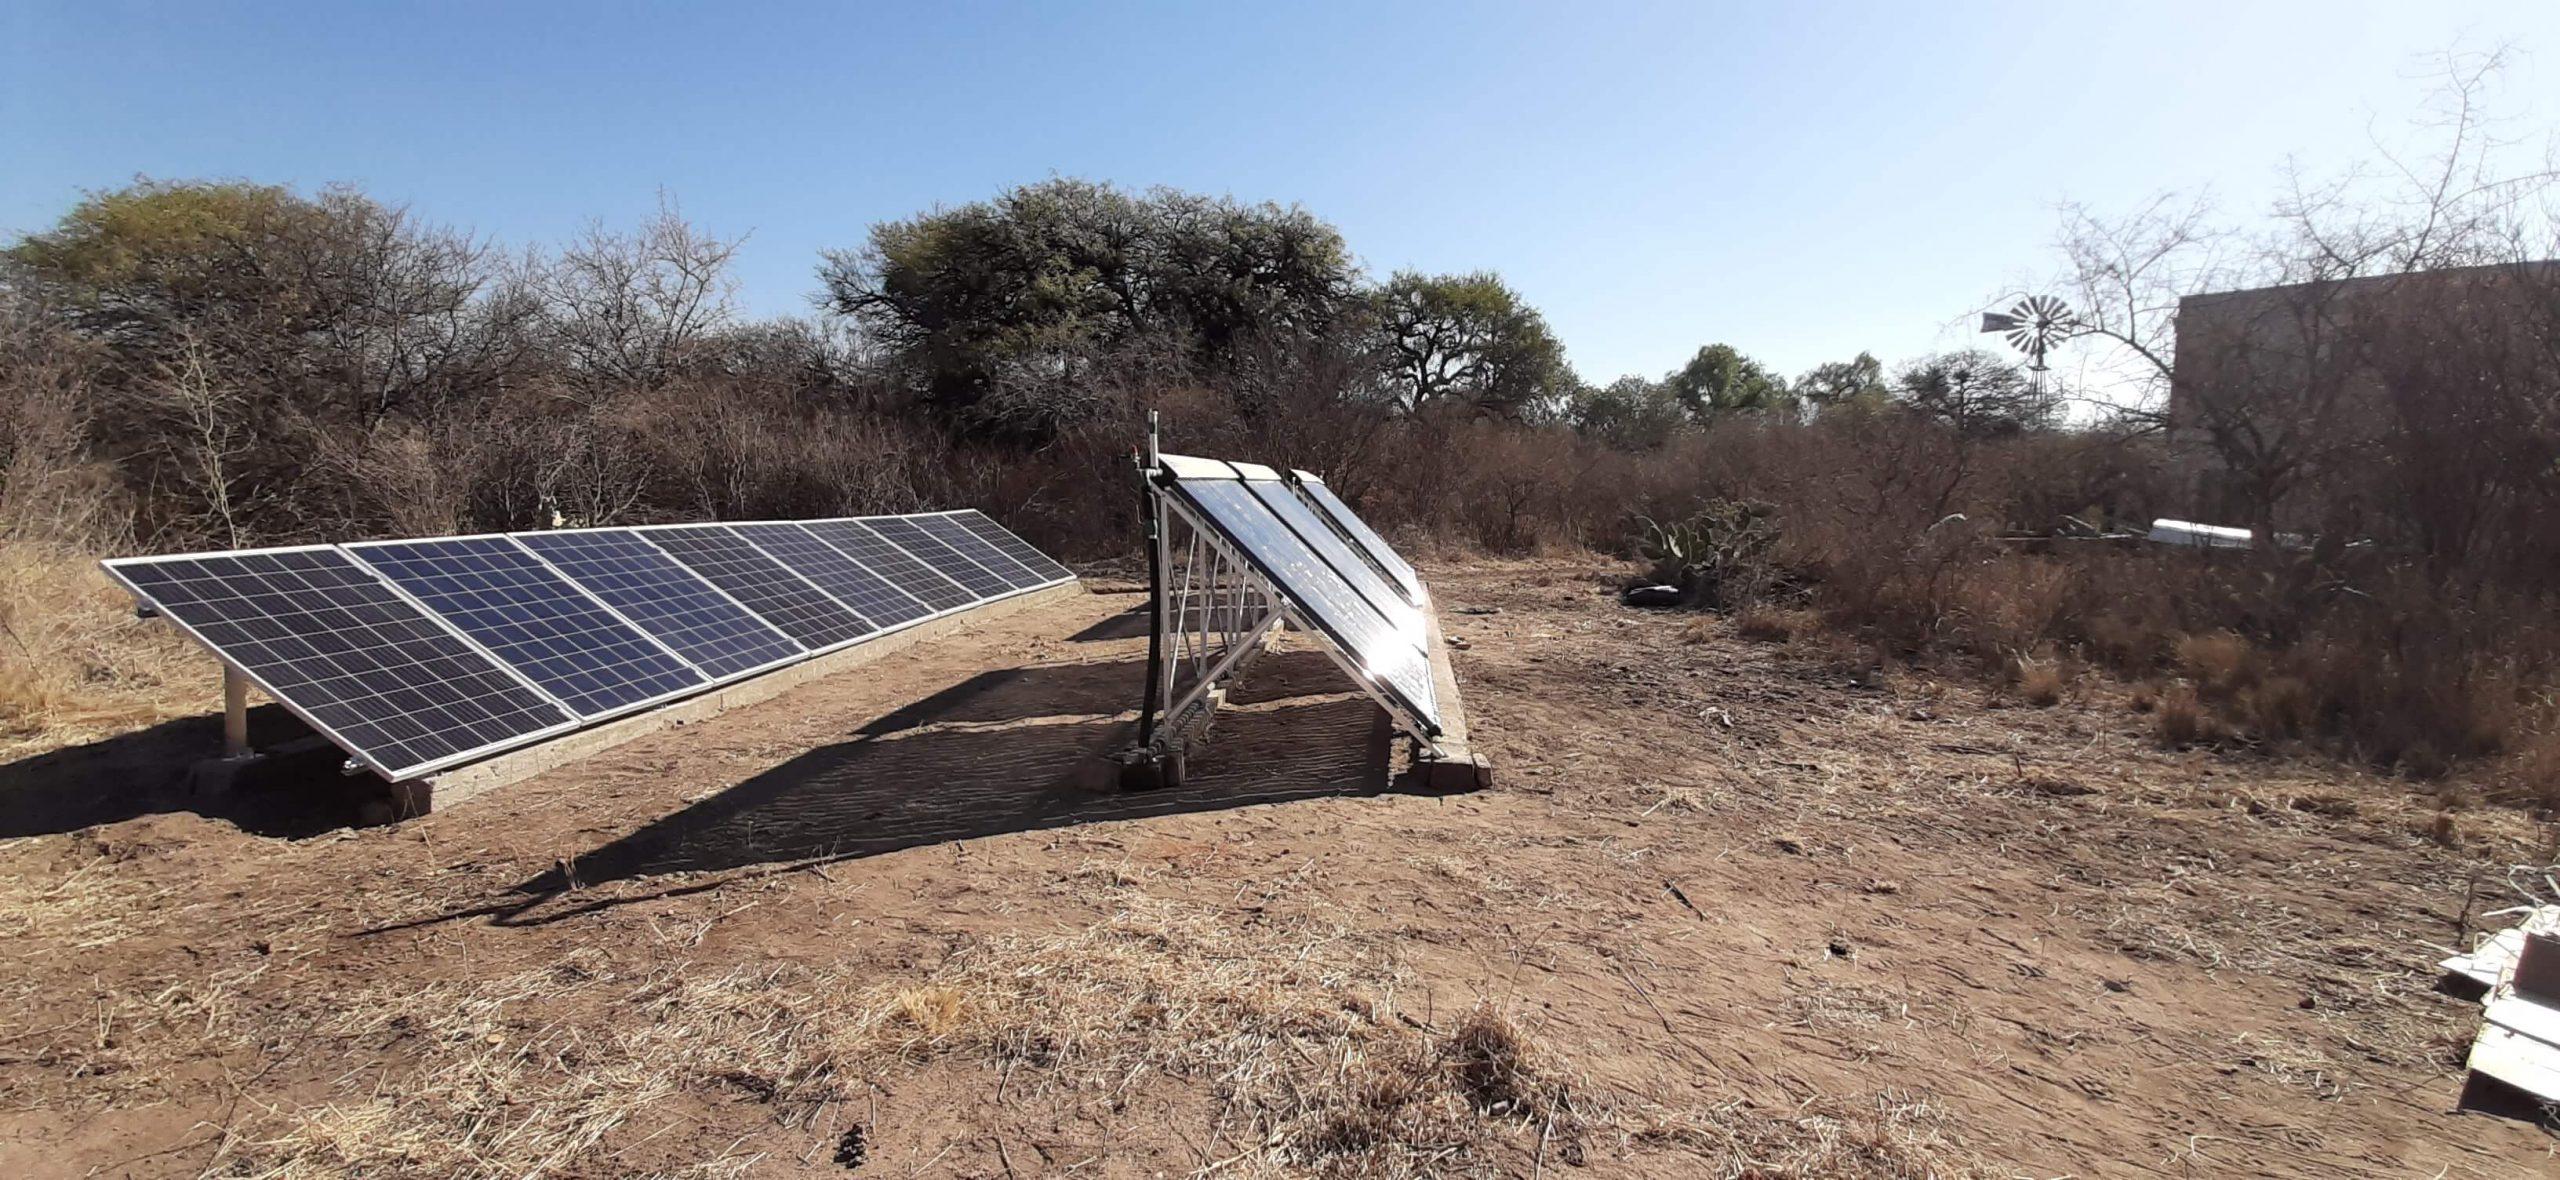 Sistema Termico y Fotovoltaico Hibrido San Marcos Sierra Córdoba